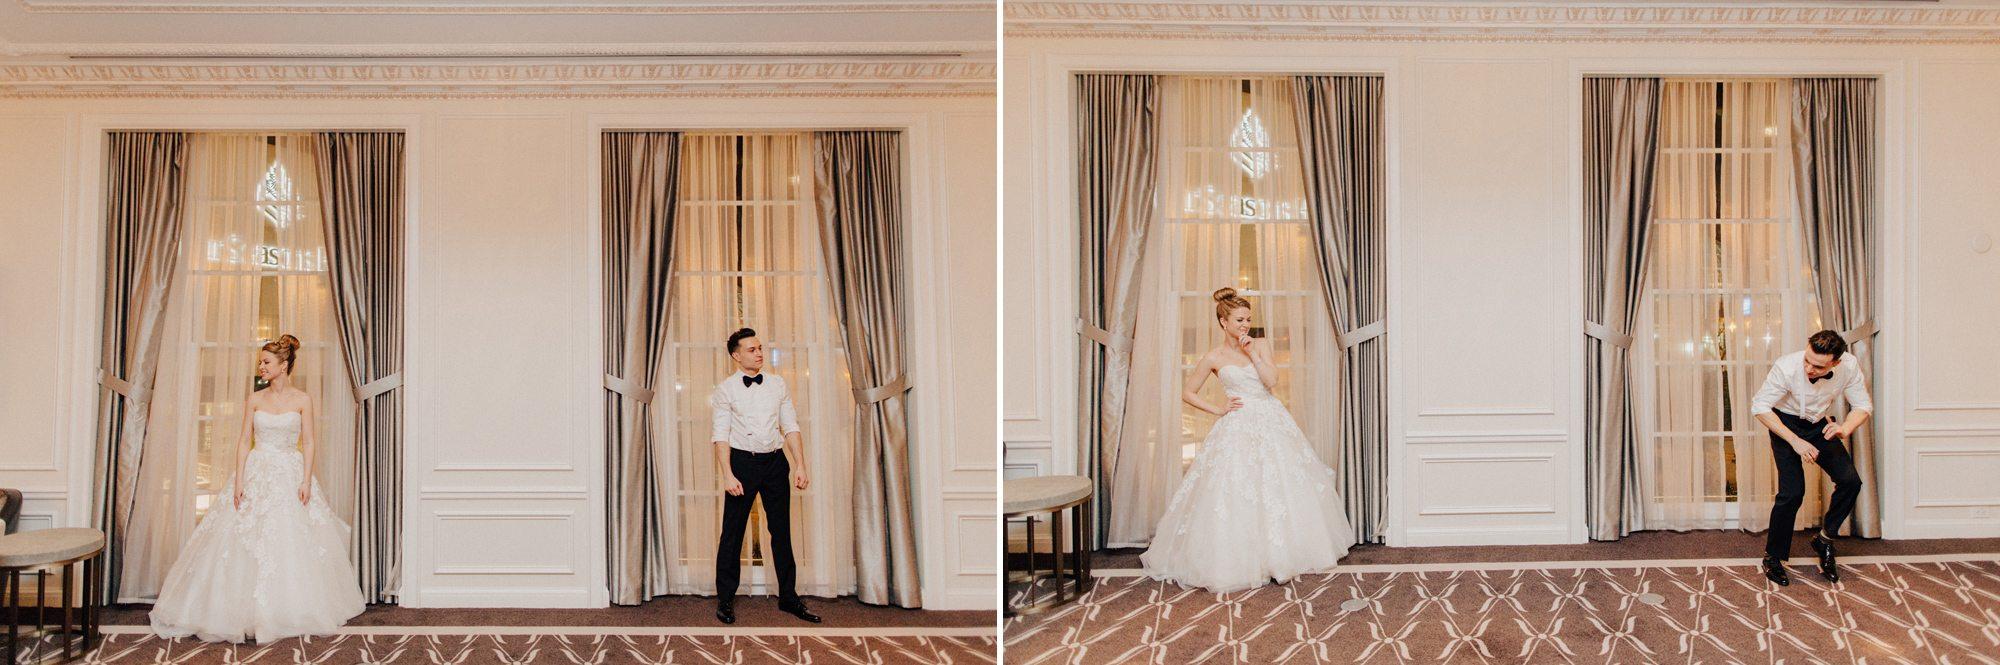 092-vancouver-wedding-photographer